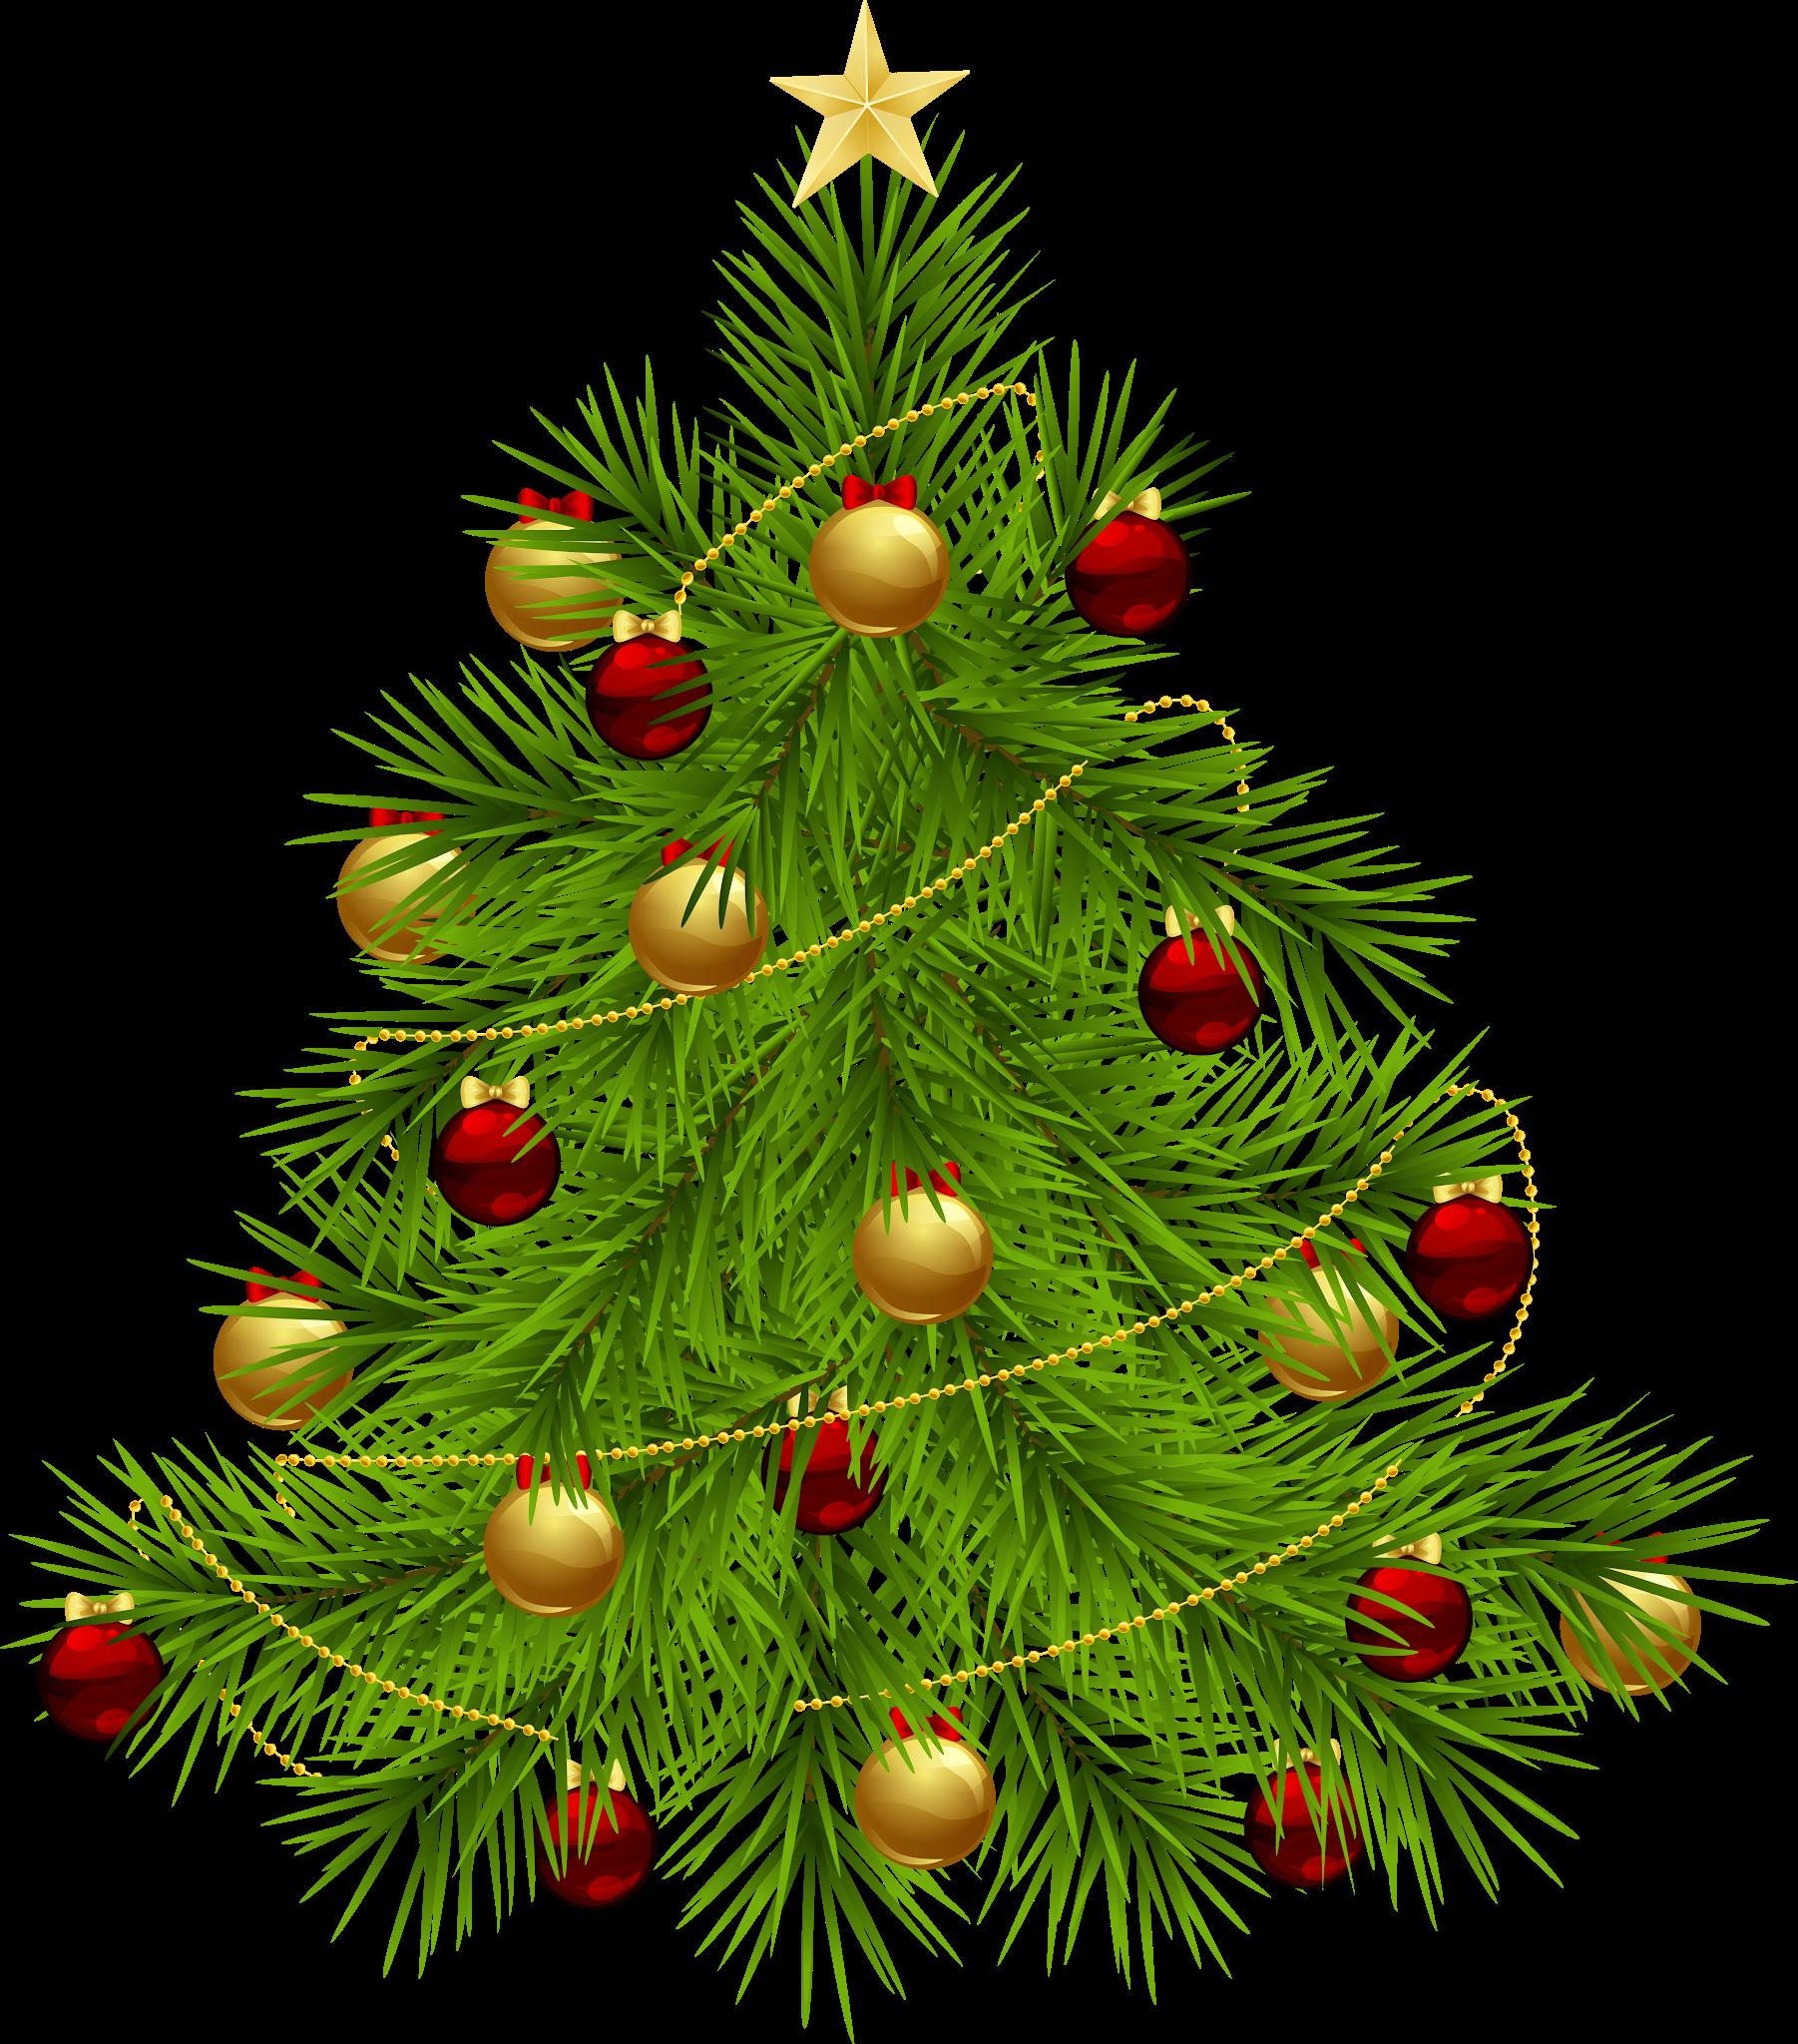 Christmas Tree Png Clipart Christmas Png Image Clipart Christmas Tree Without Ornaments Christmas Tree Clipart Christmas Tree Star